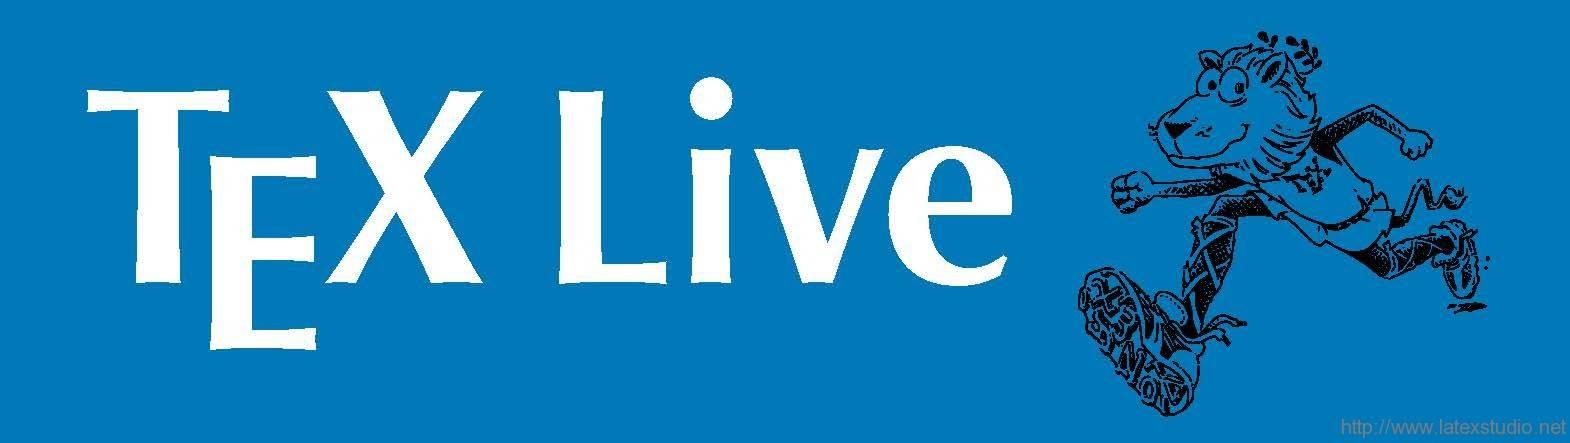 texlive_logo